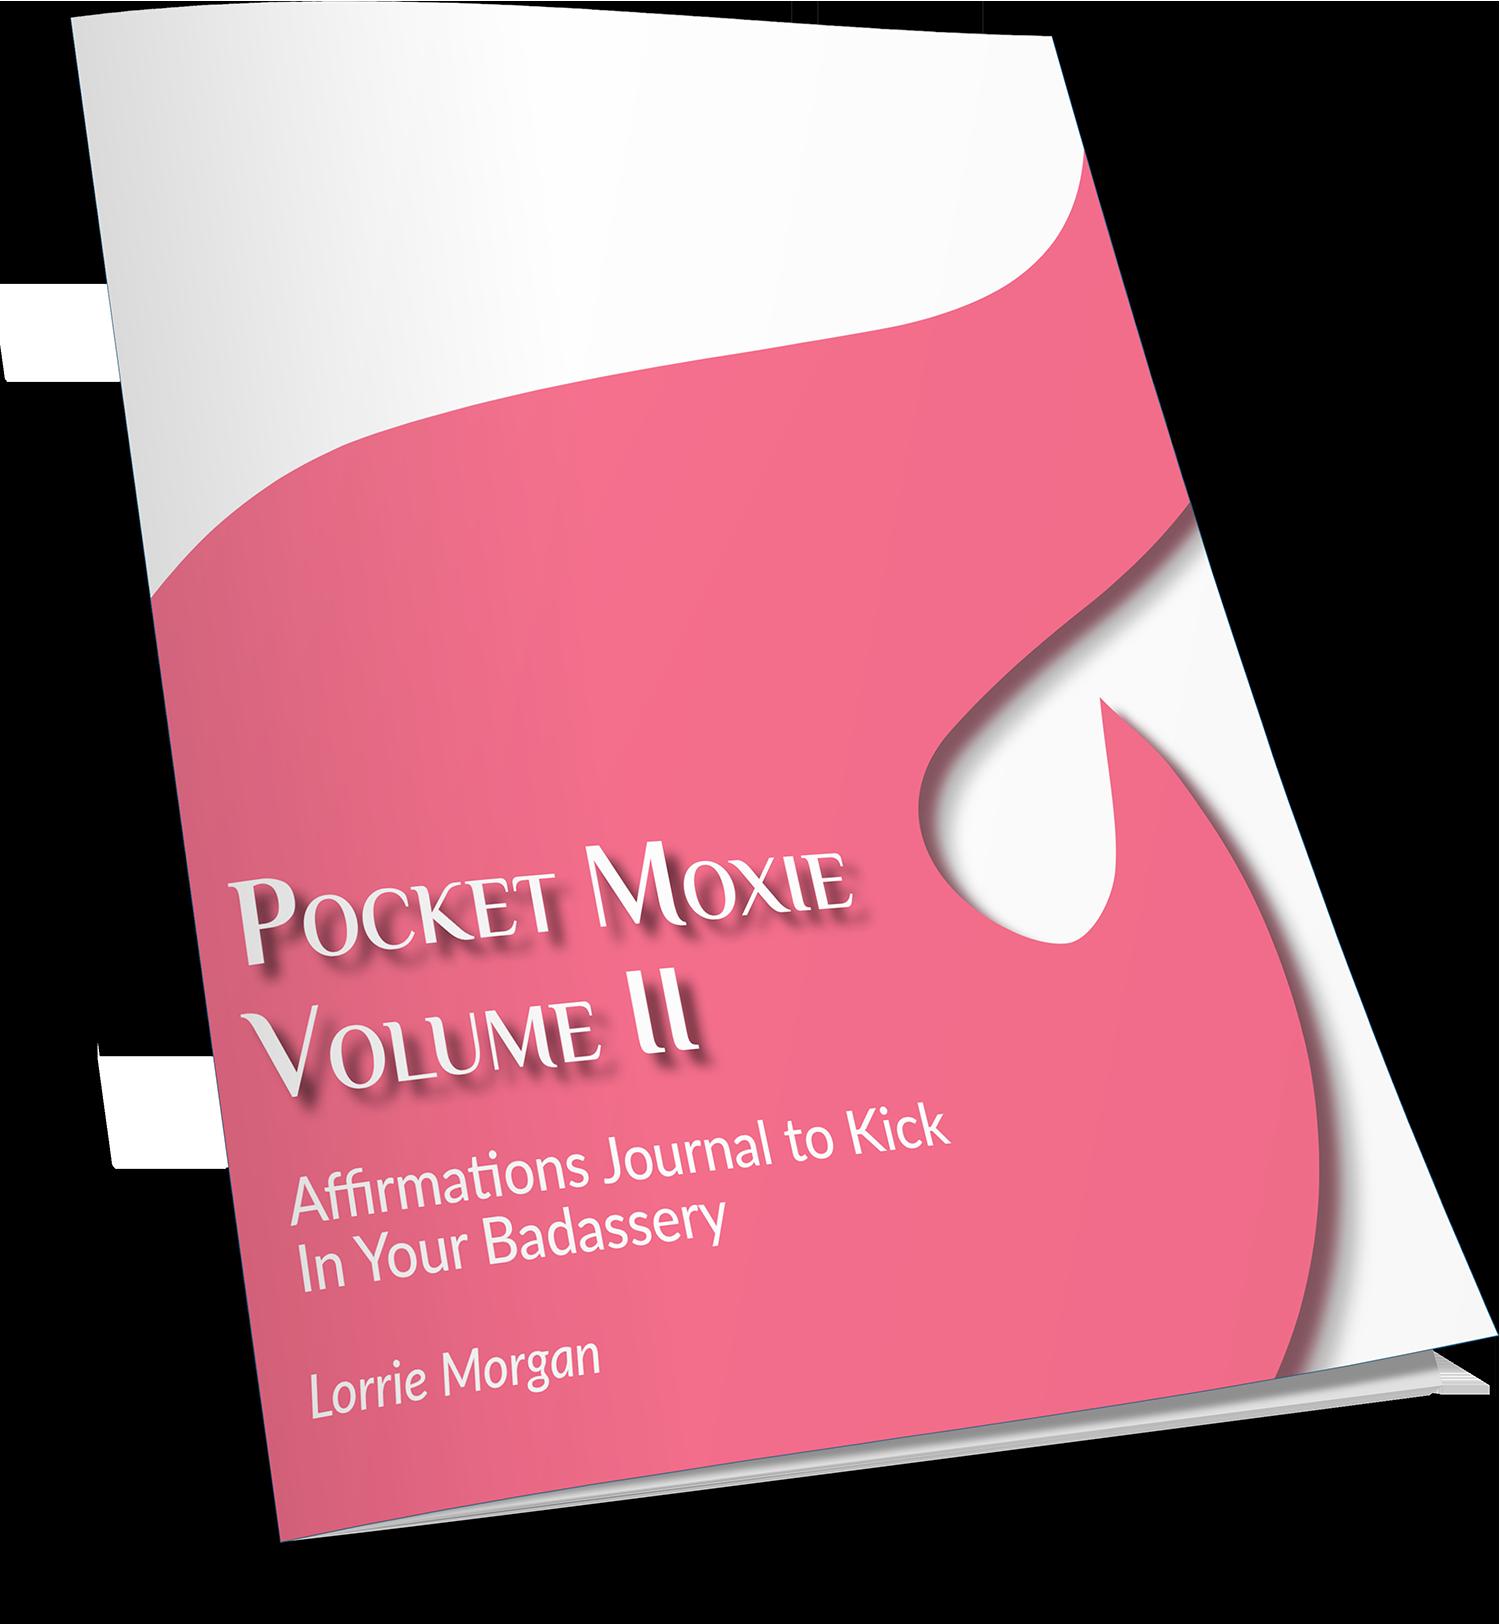 Pocket Moxie V2